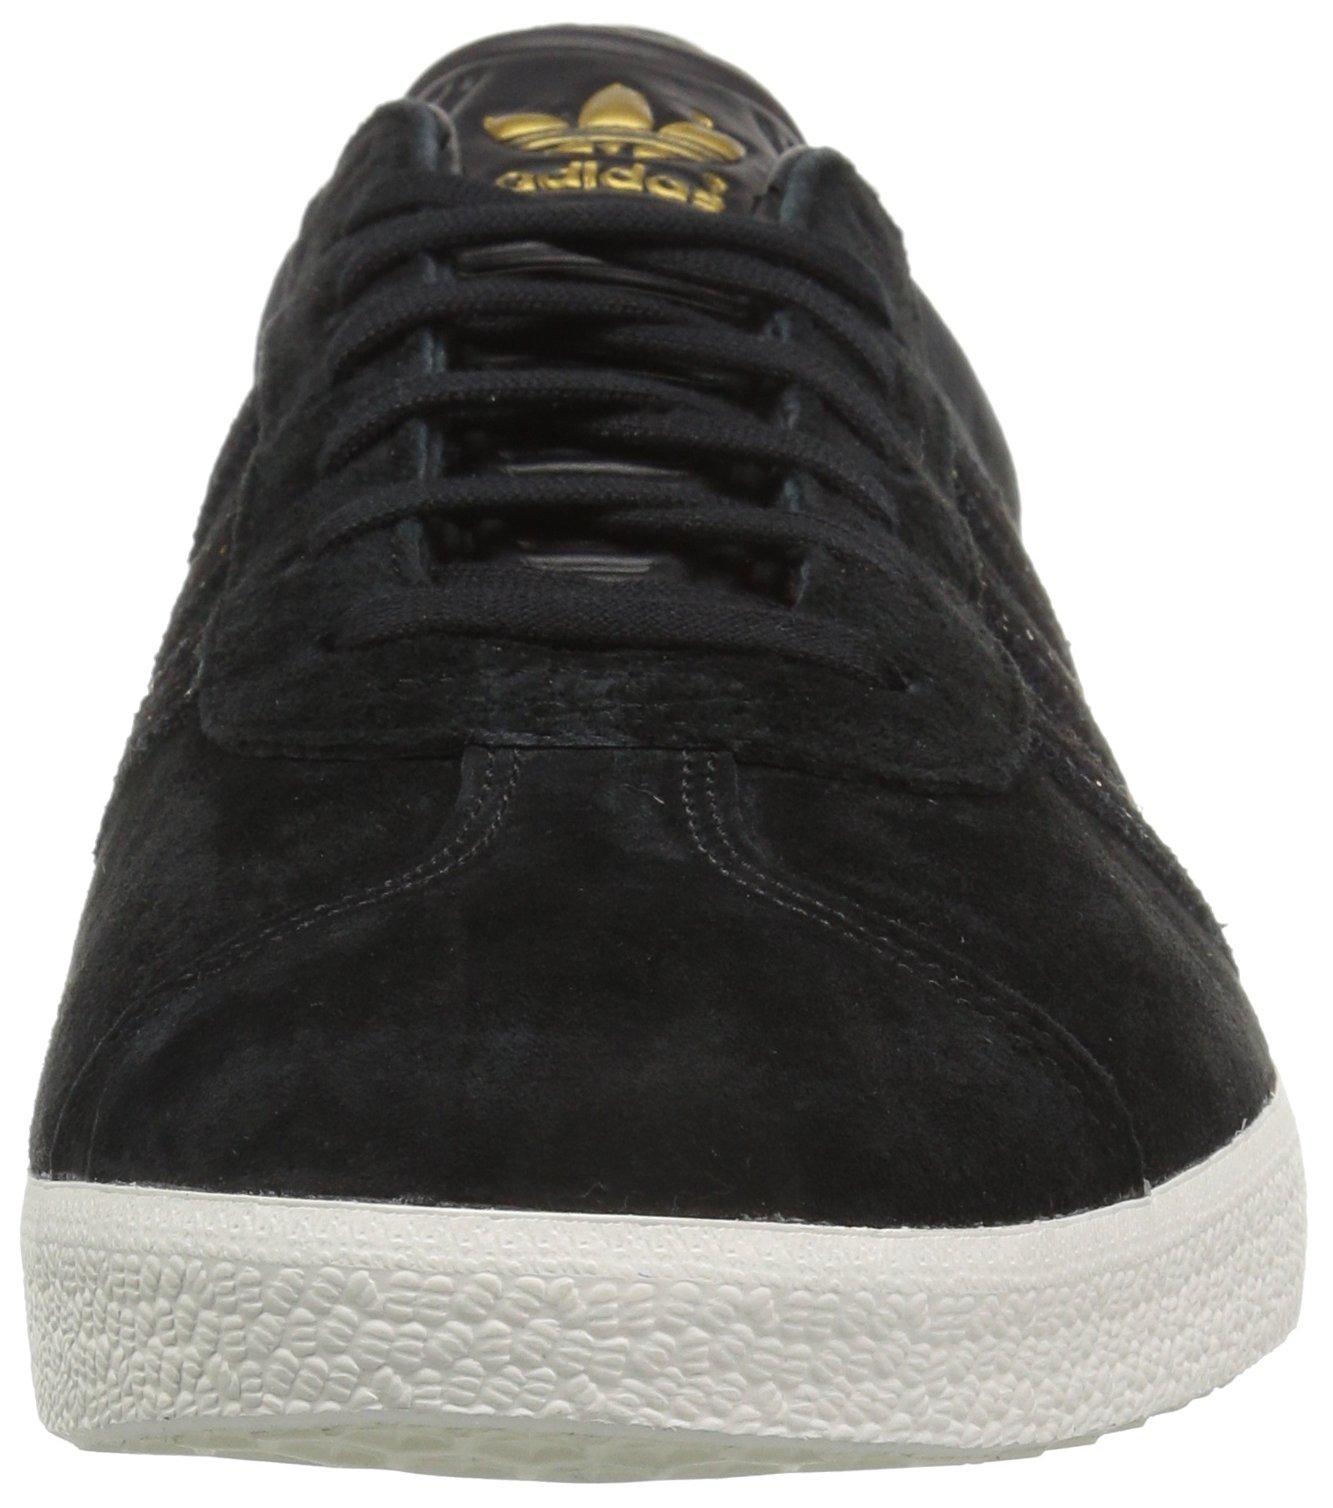 a74f4cced40b adidas Originals Gazelle W Suede Pink Ash White Linen Women Shoes ...